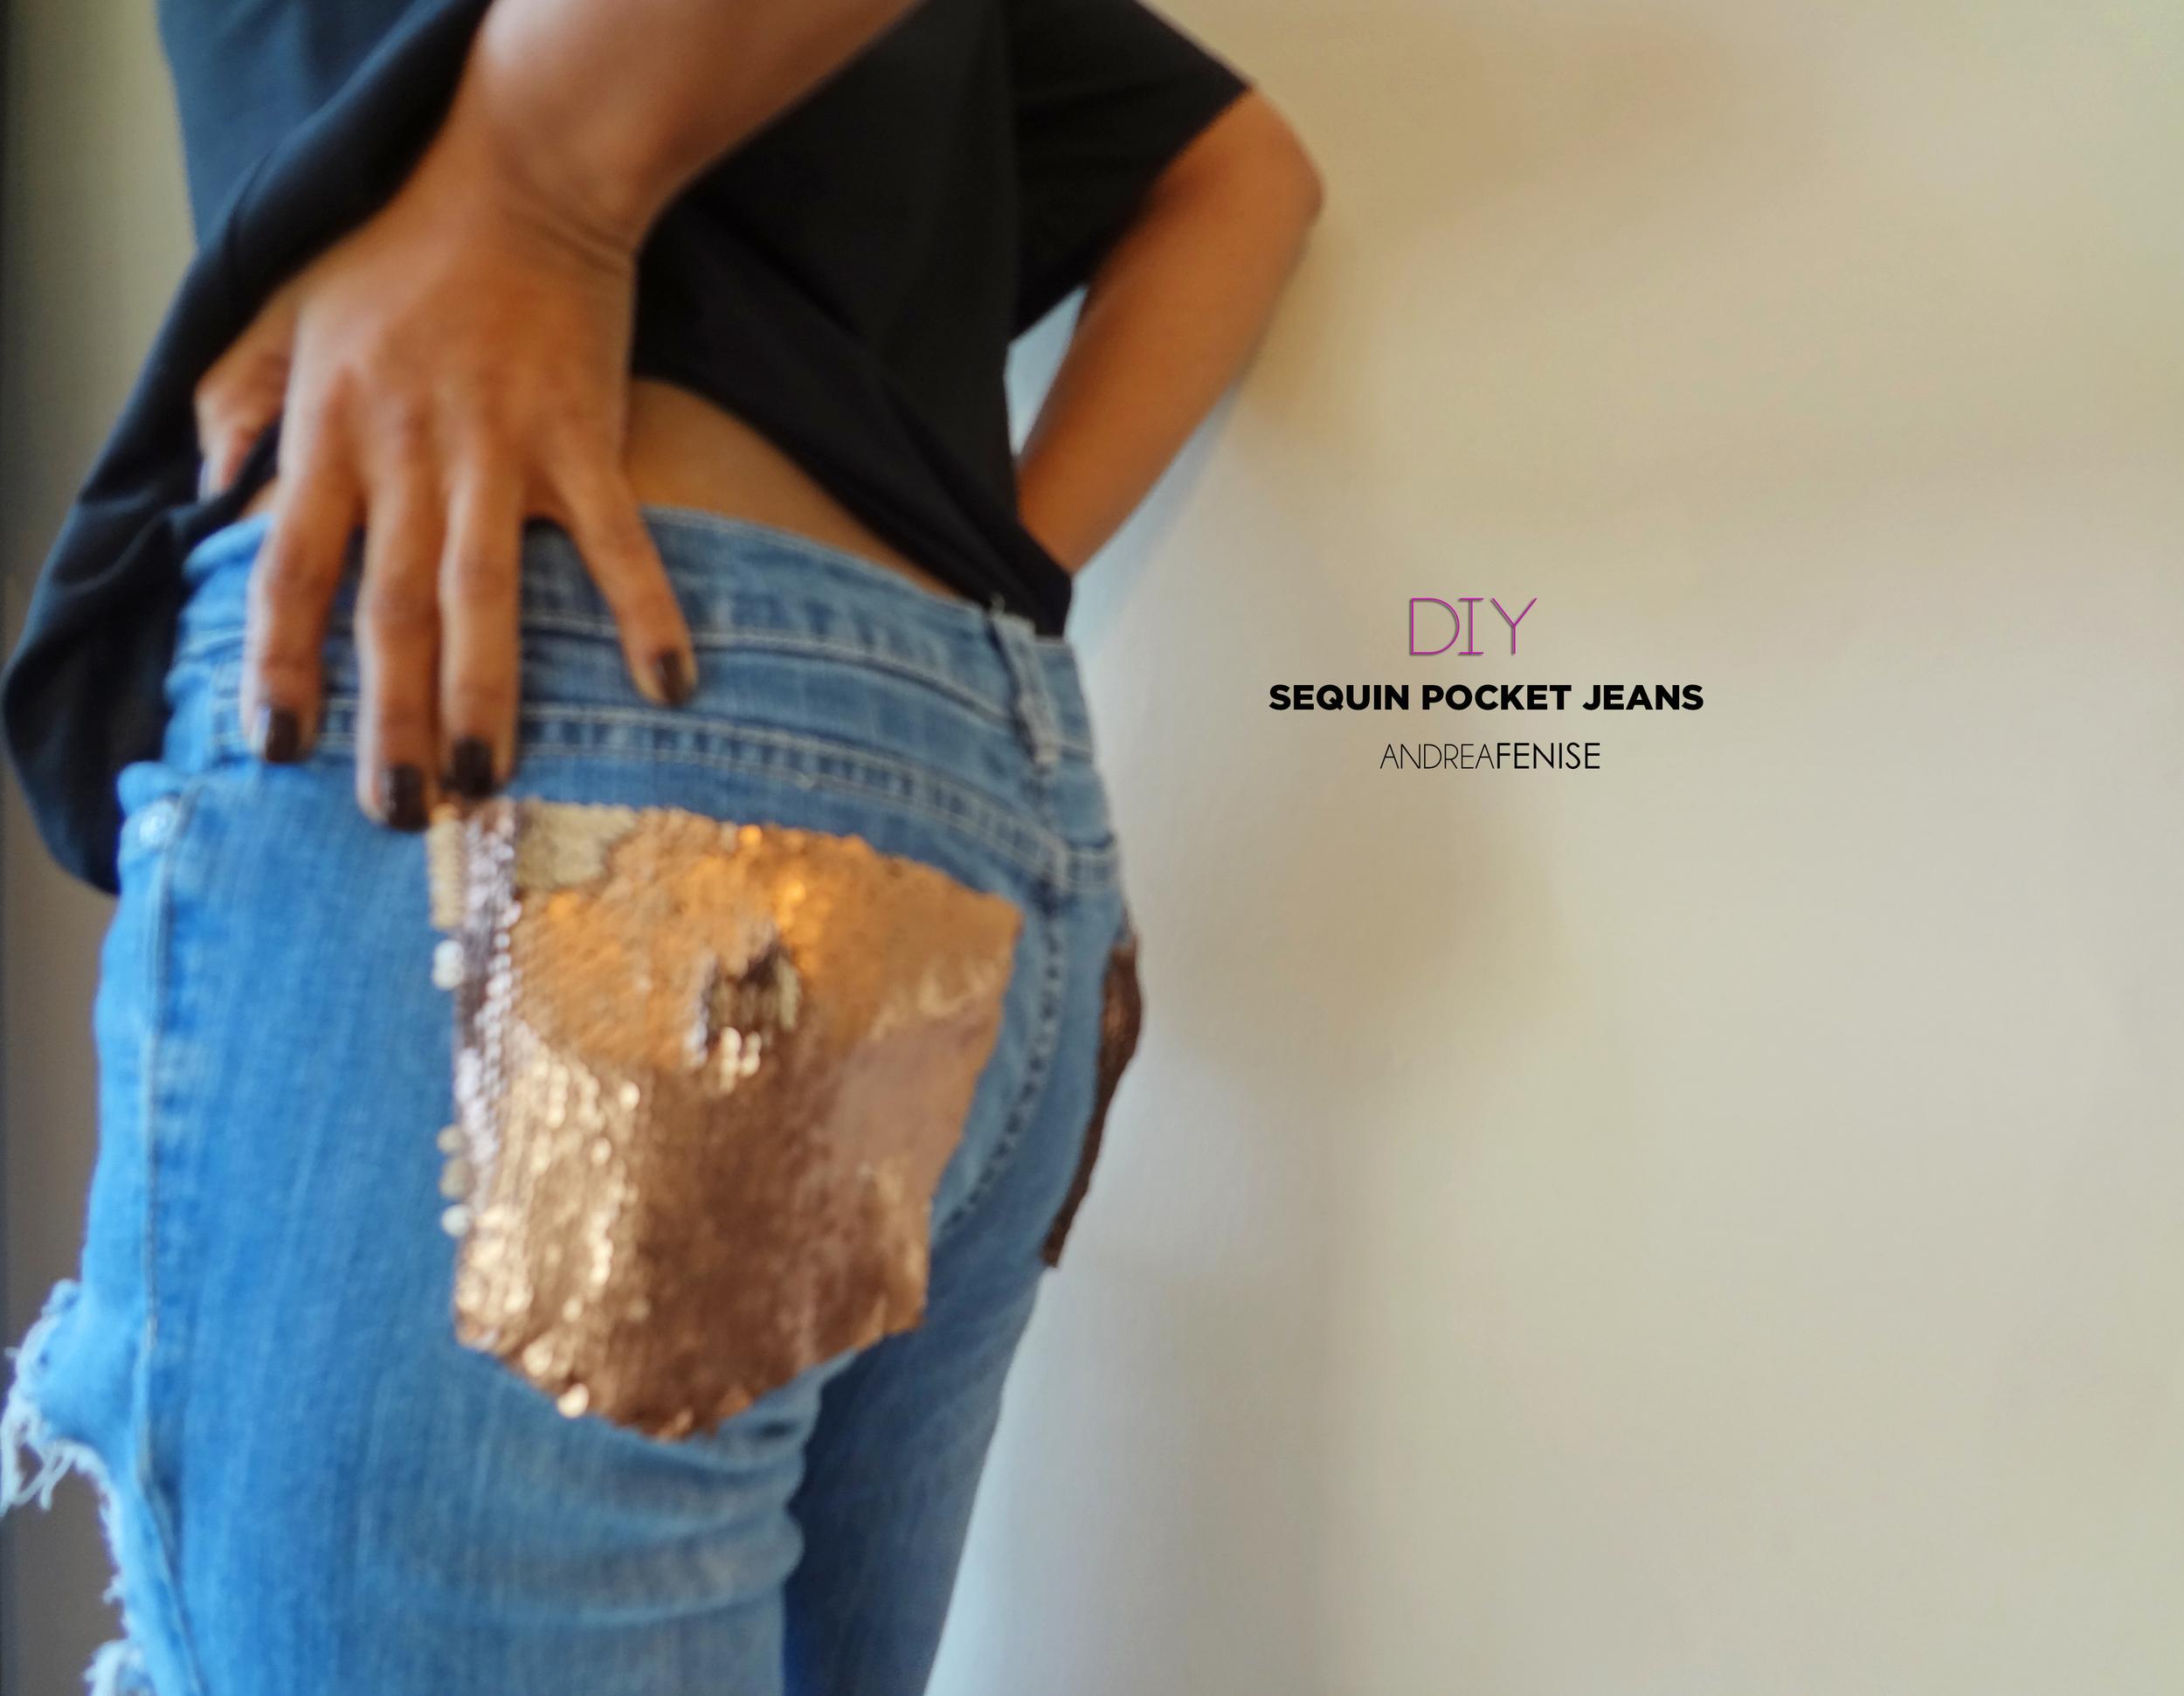 andrea-fenise-diy-sequin-pocket-jeans